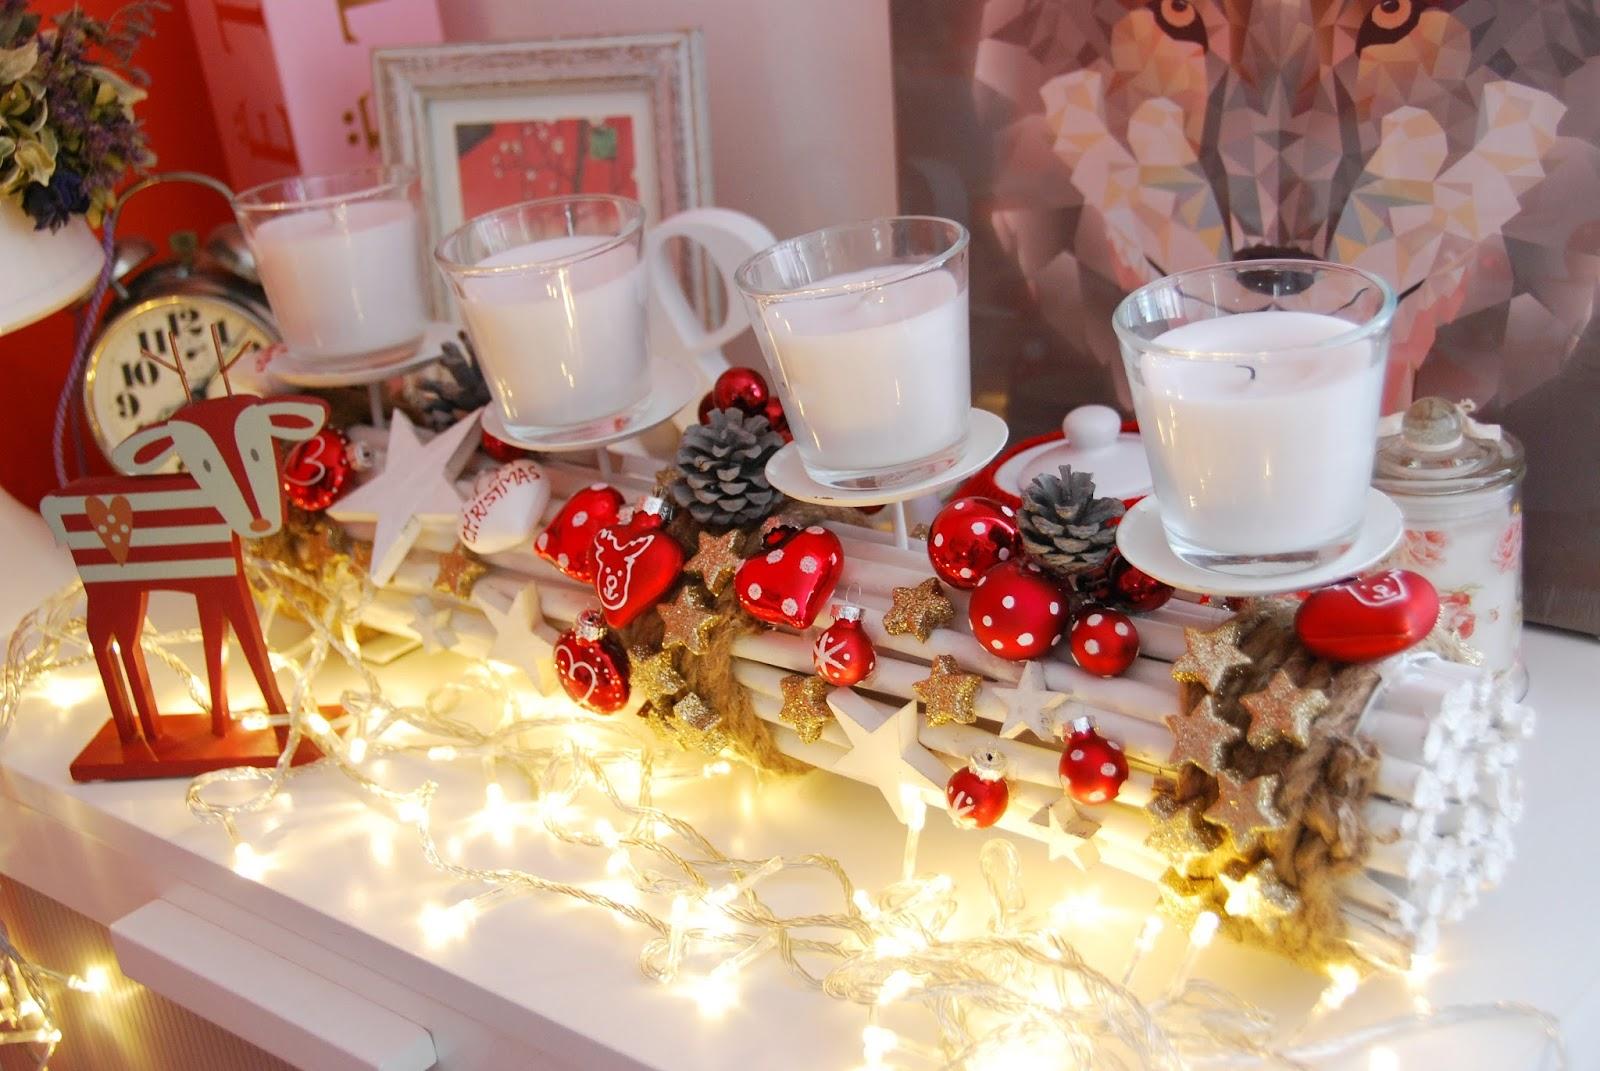 beautyglace deko weihnachten bei depot. Black Bedroom Furniture Sets. Home Design Ideas